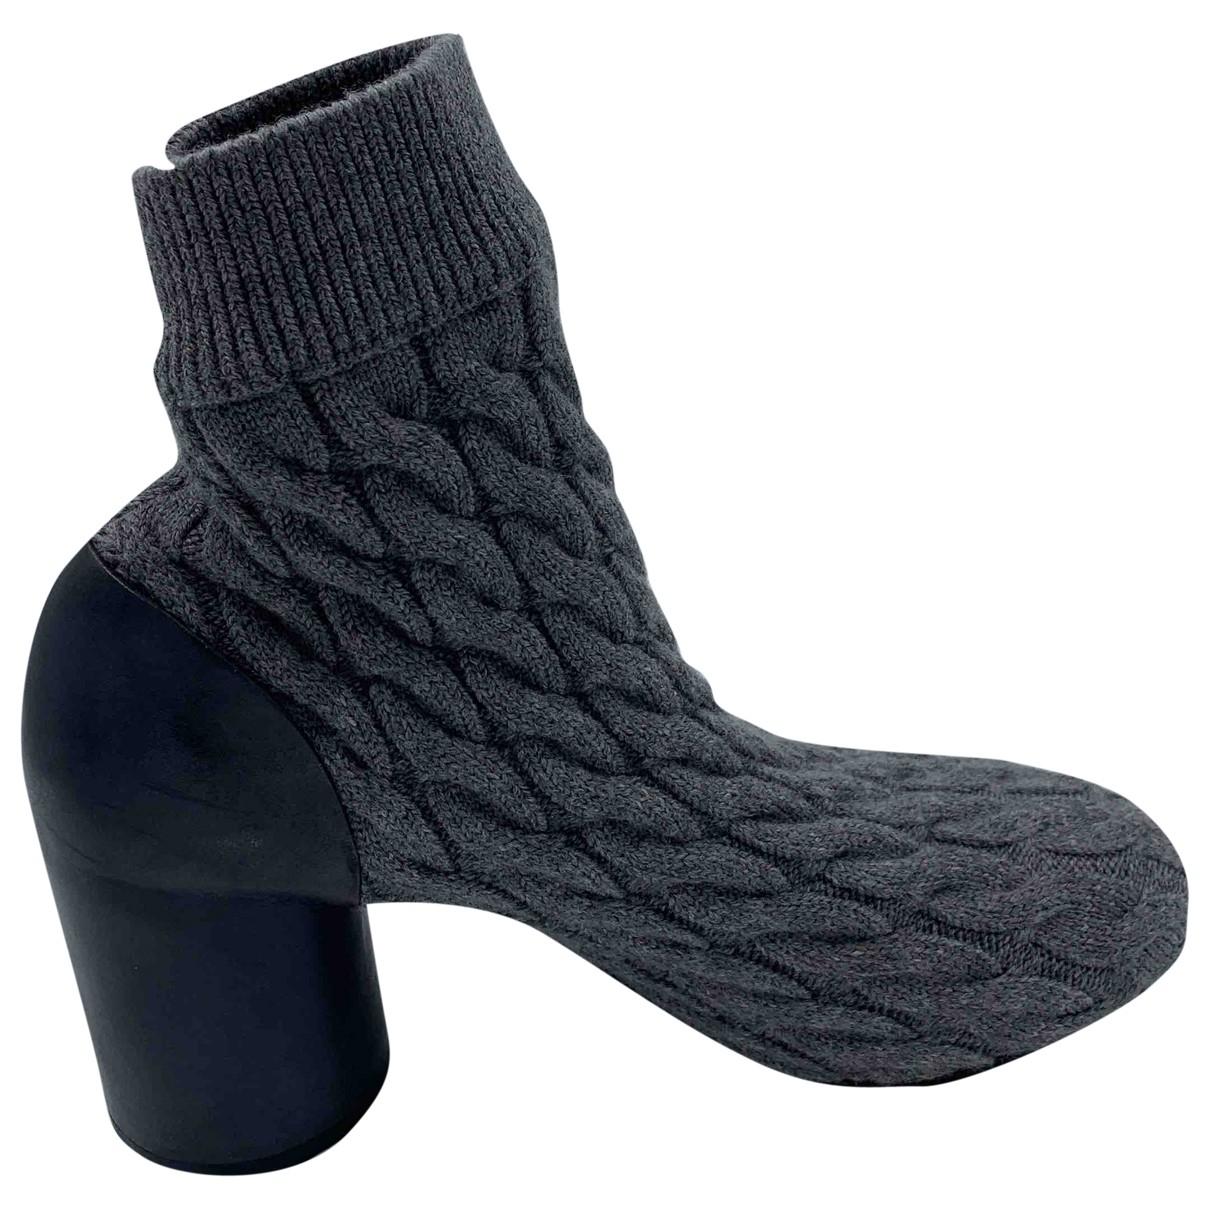 Maison Martin Margiela \N Grey Cloth Ankle boots for Women 39.5 EU